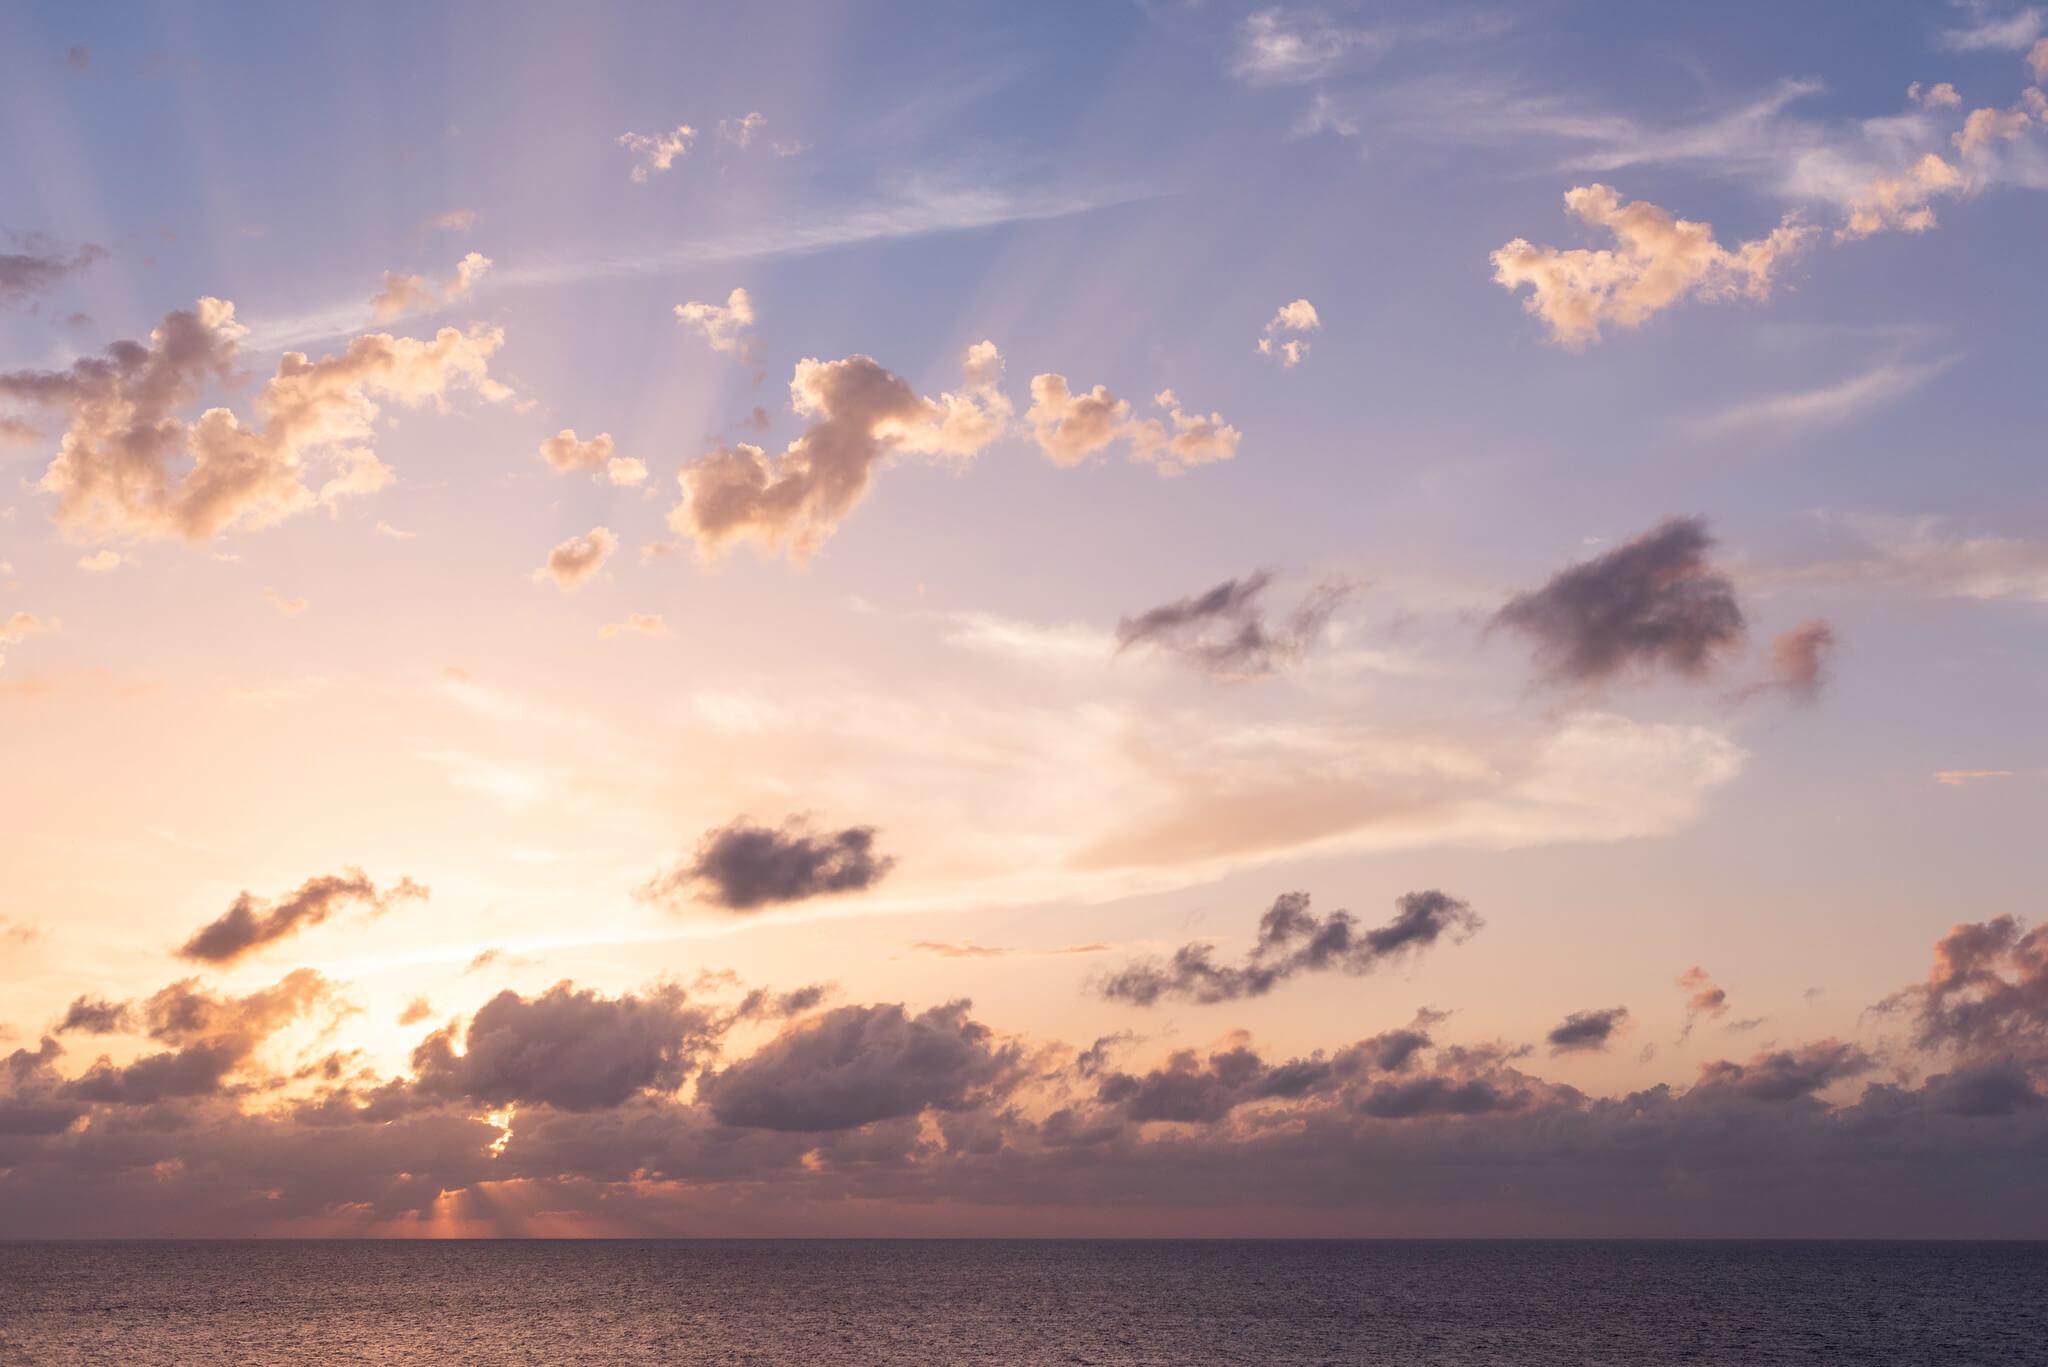 https://www.white-ibiza.com/wp-content/uploads/2020/03/ibiza-sunsets-la-torre-ibiza-2020-02.jpg